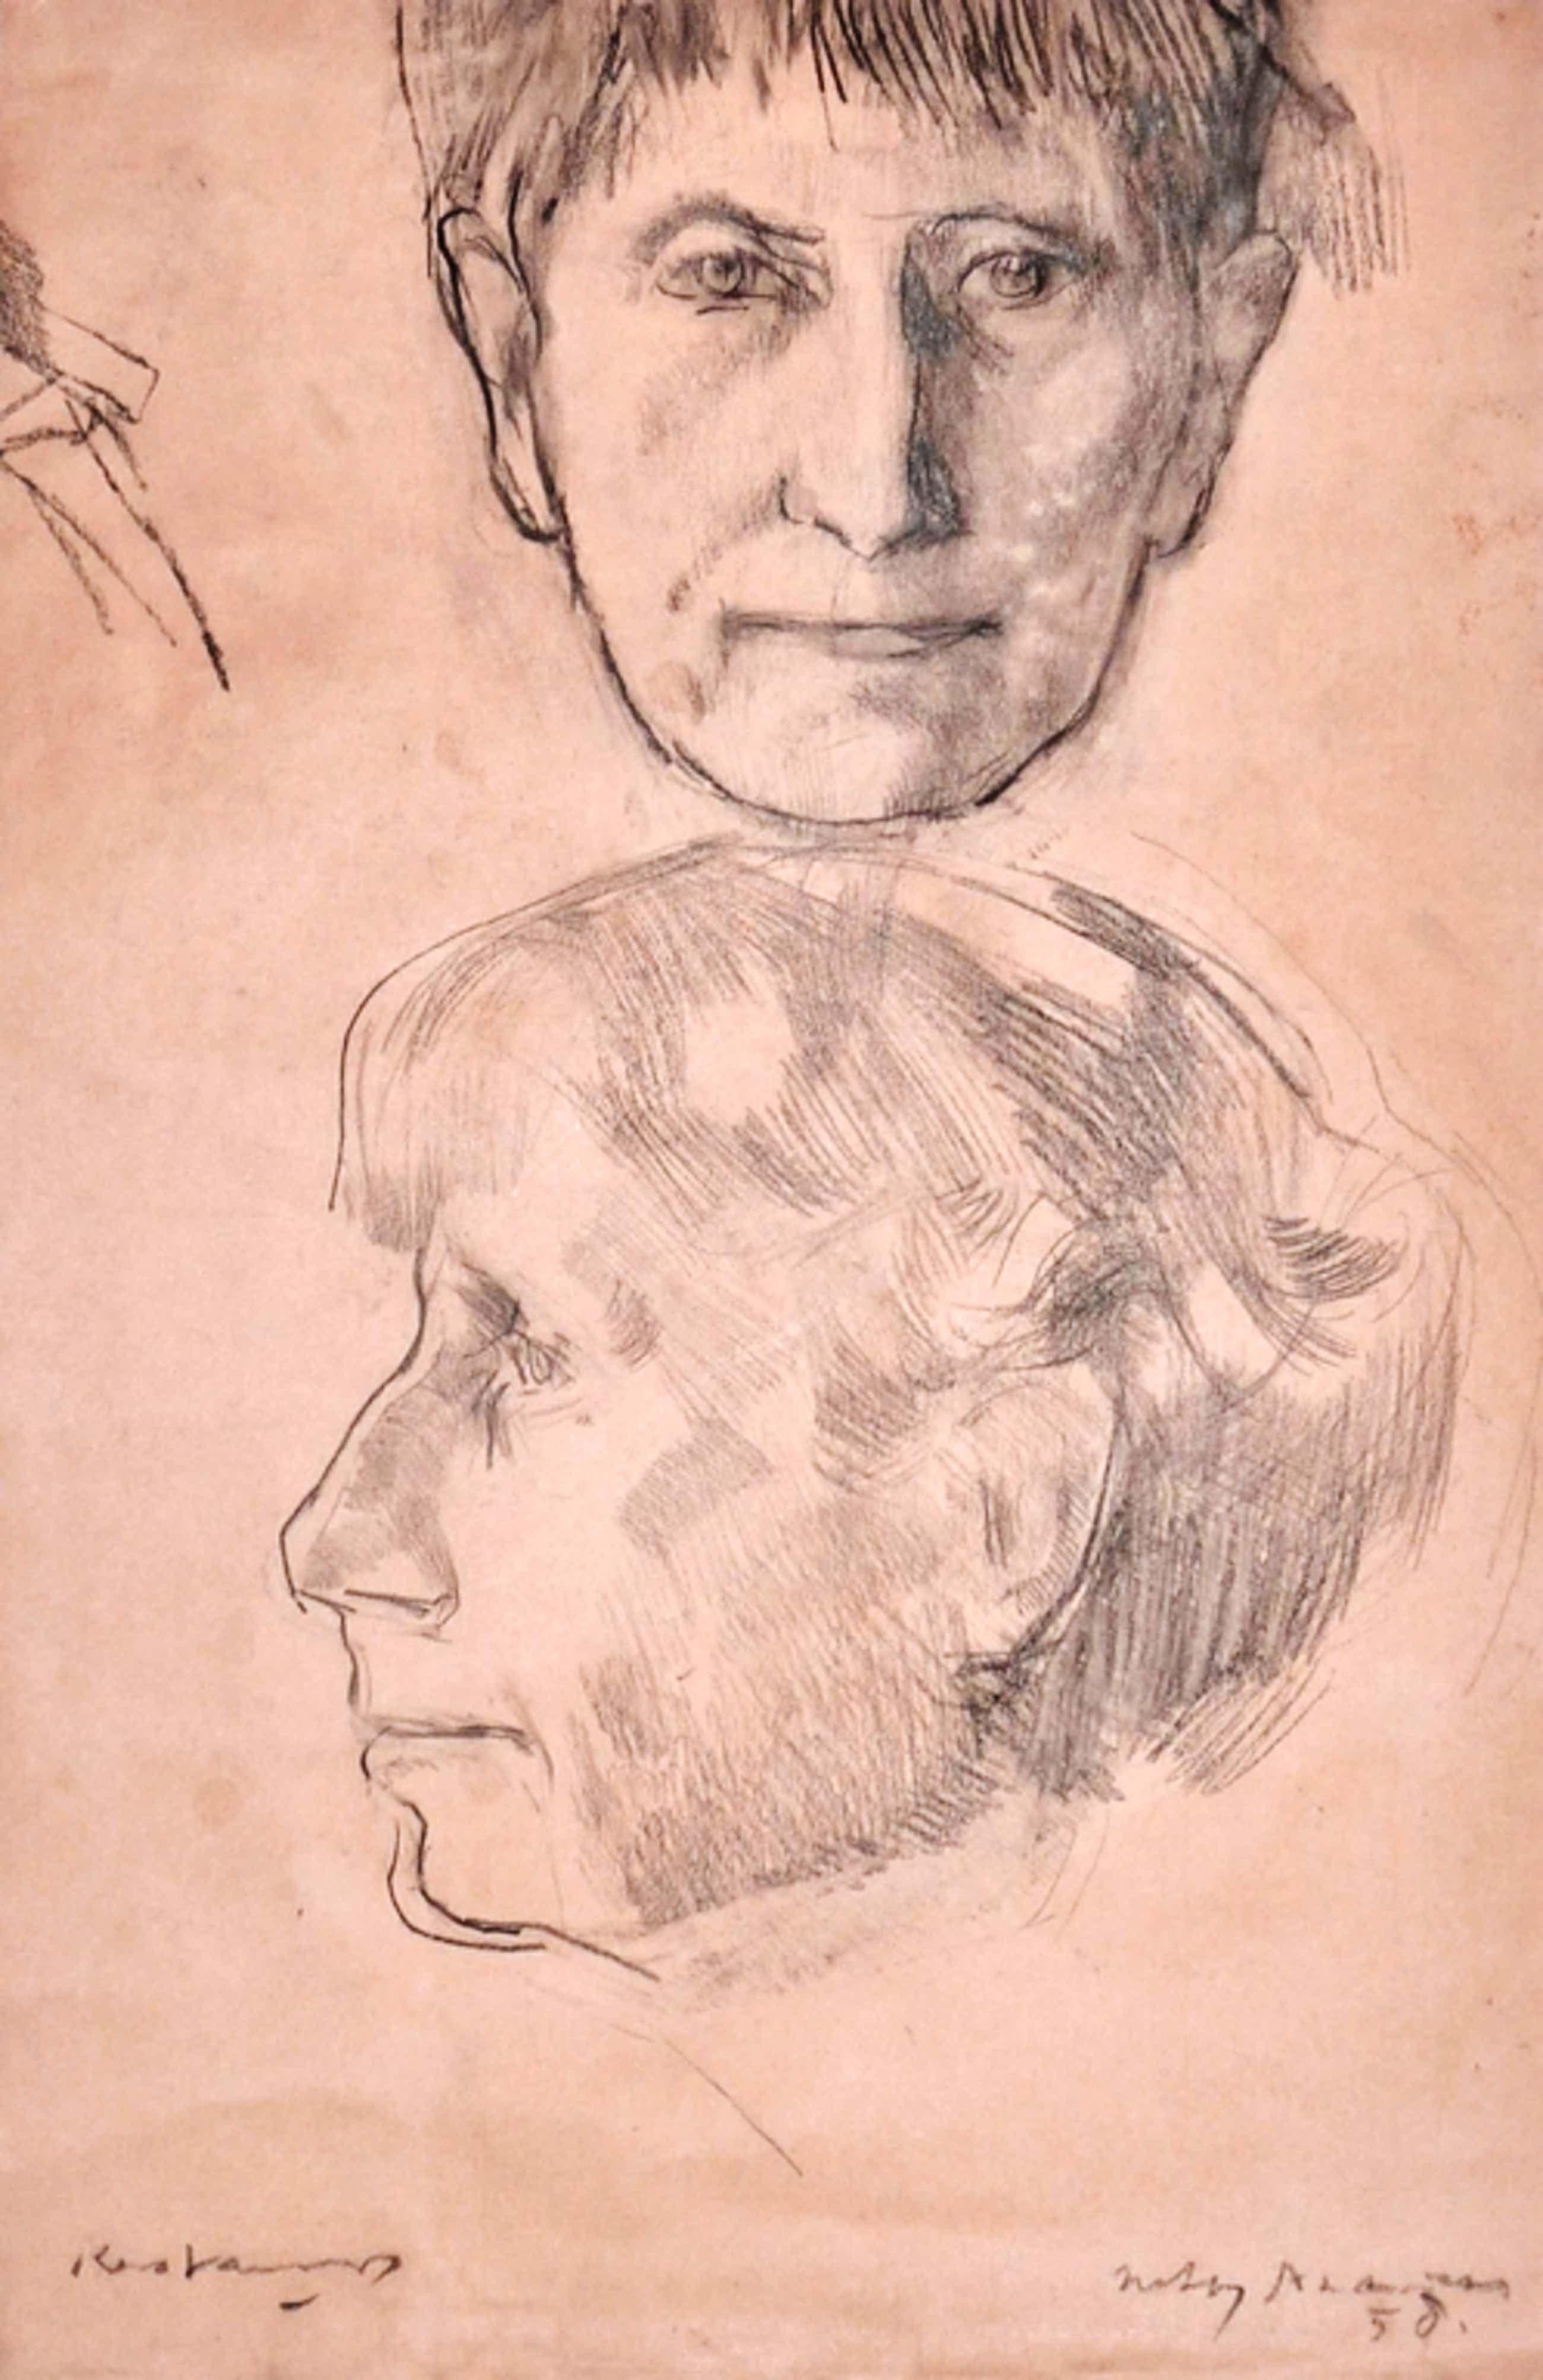 Kees Verwey, Krijttekening, Dubbele portrettekening, 1958 kopen? Bied vanaf 200!